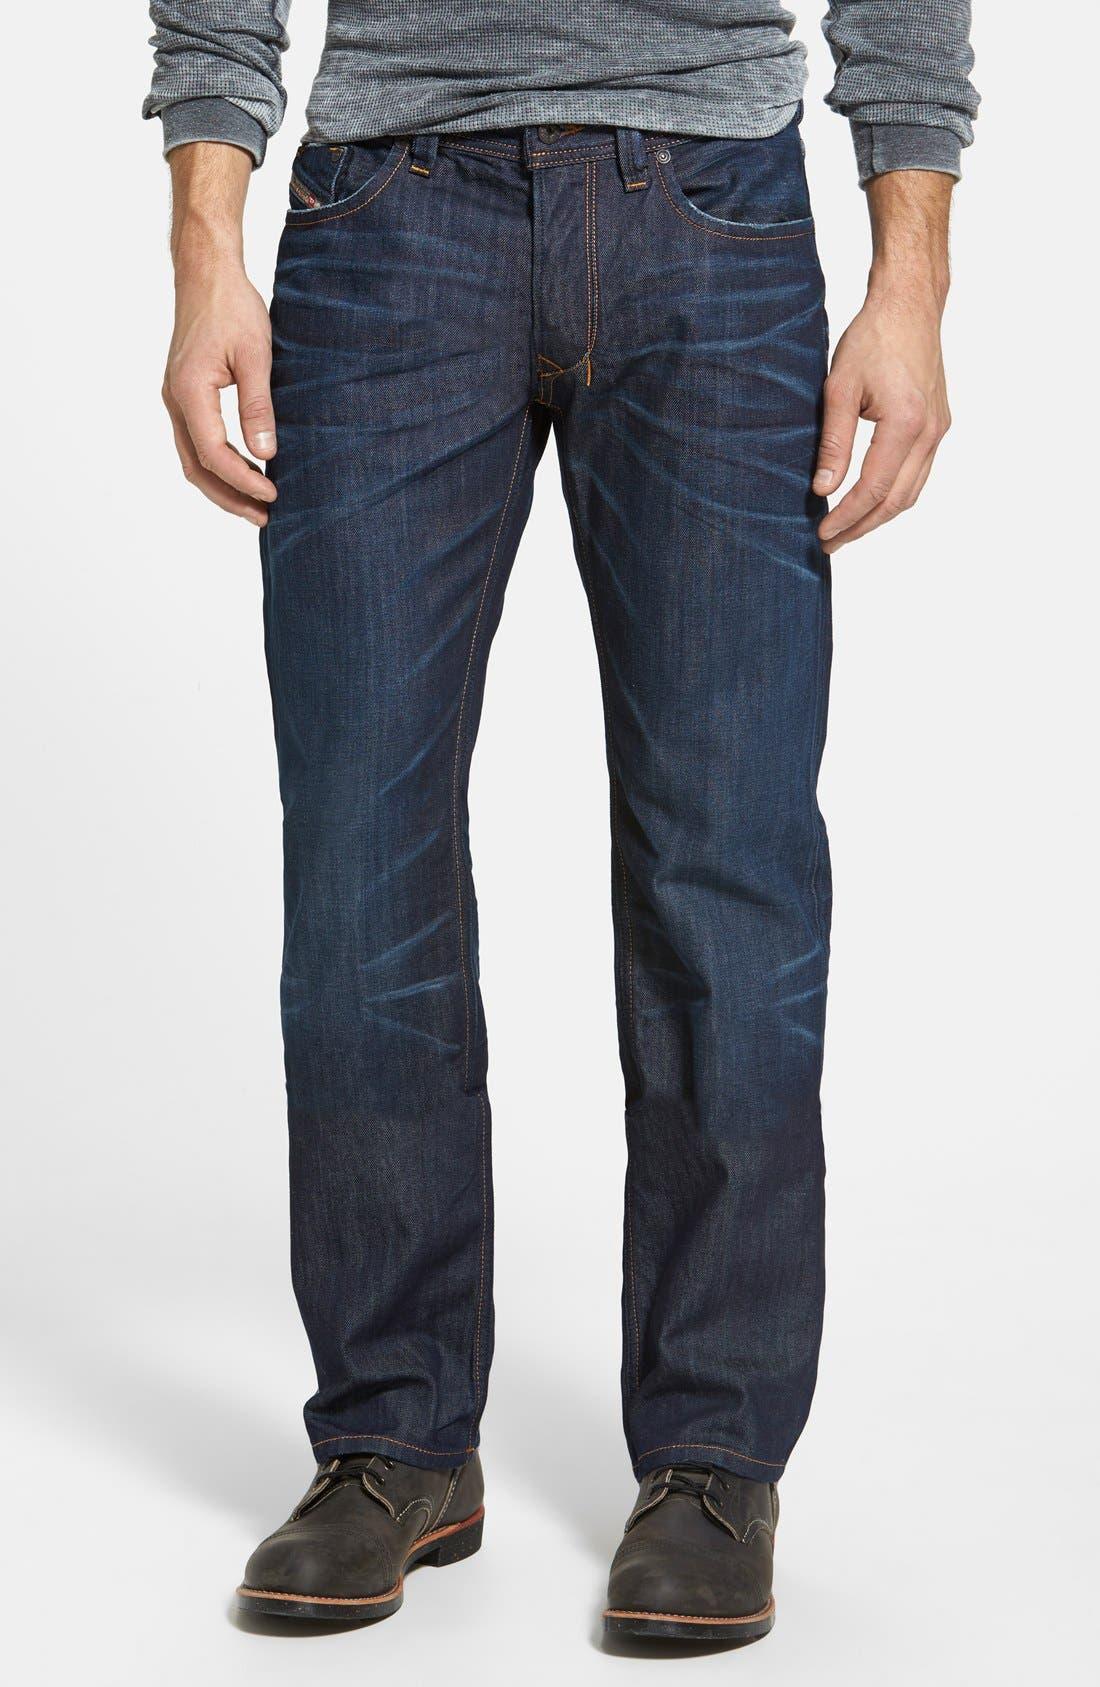 Larkee Straight Leg Jeans,                         Main,                         color, 0806W